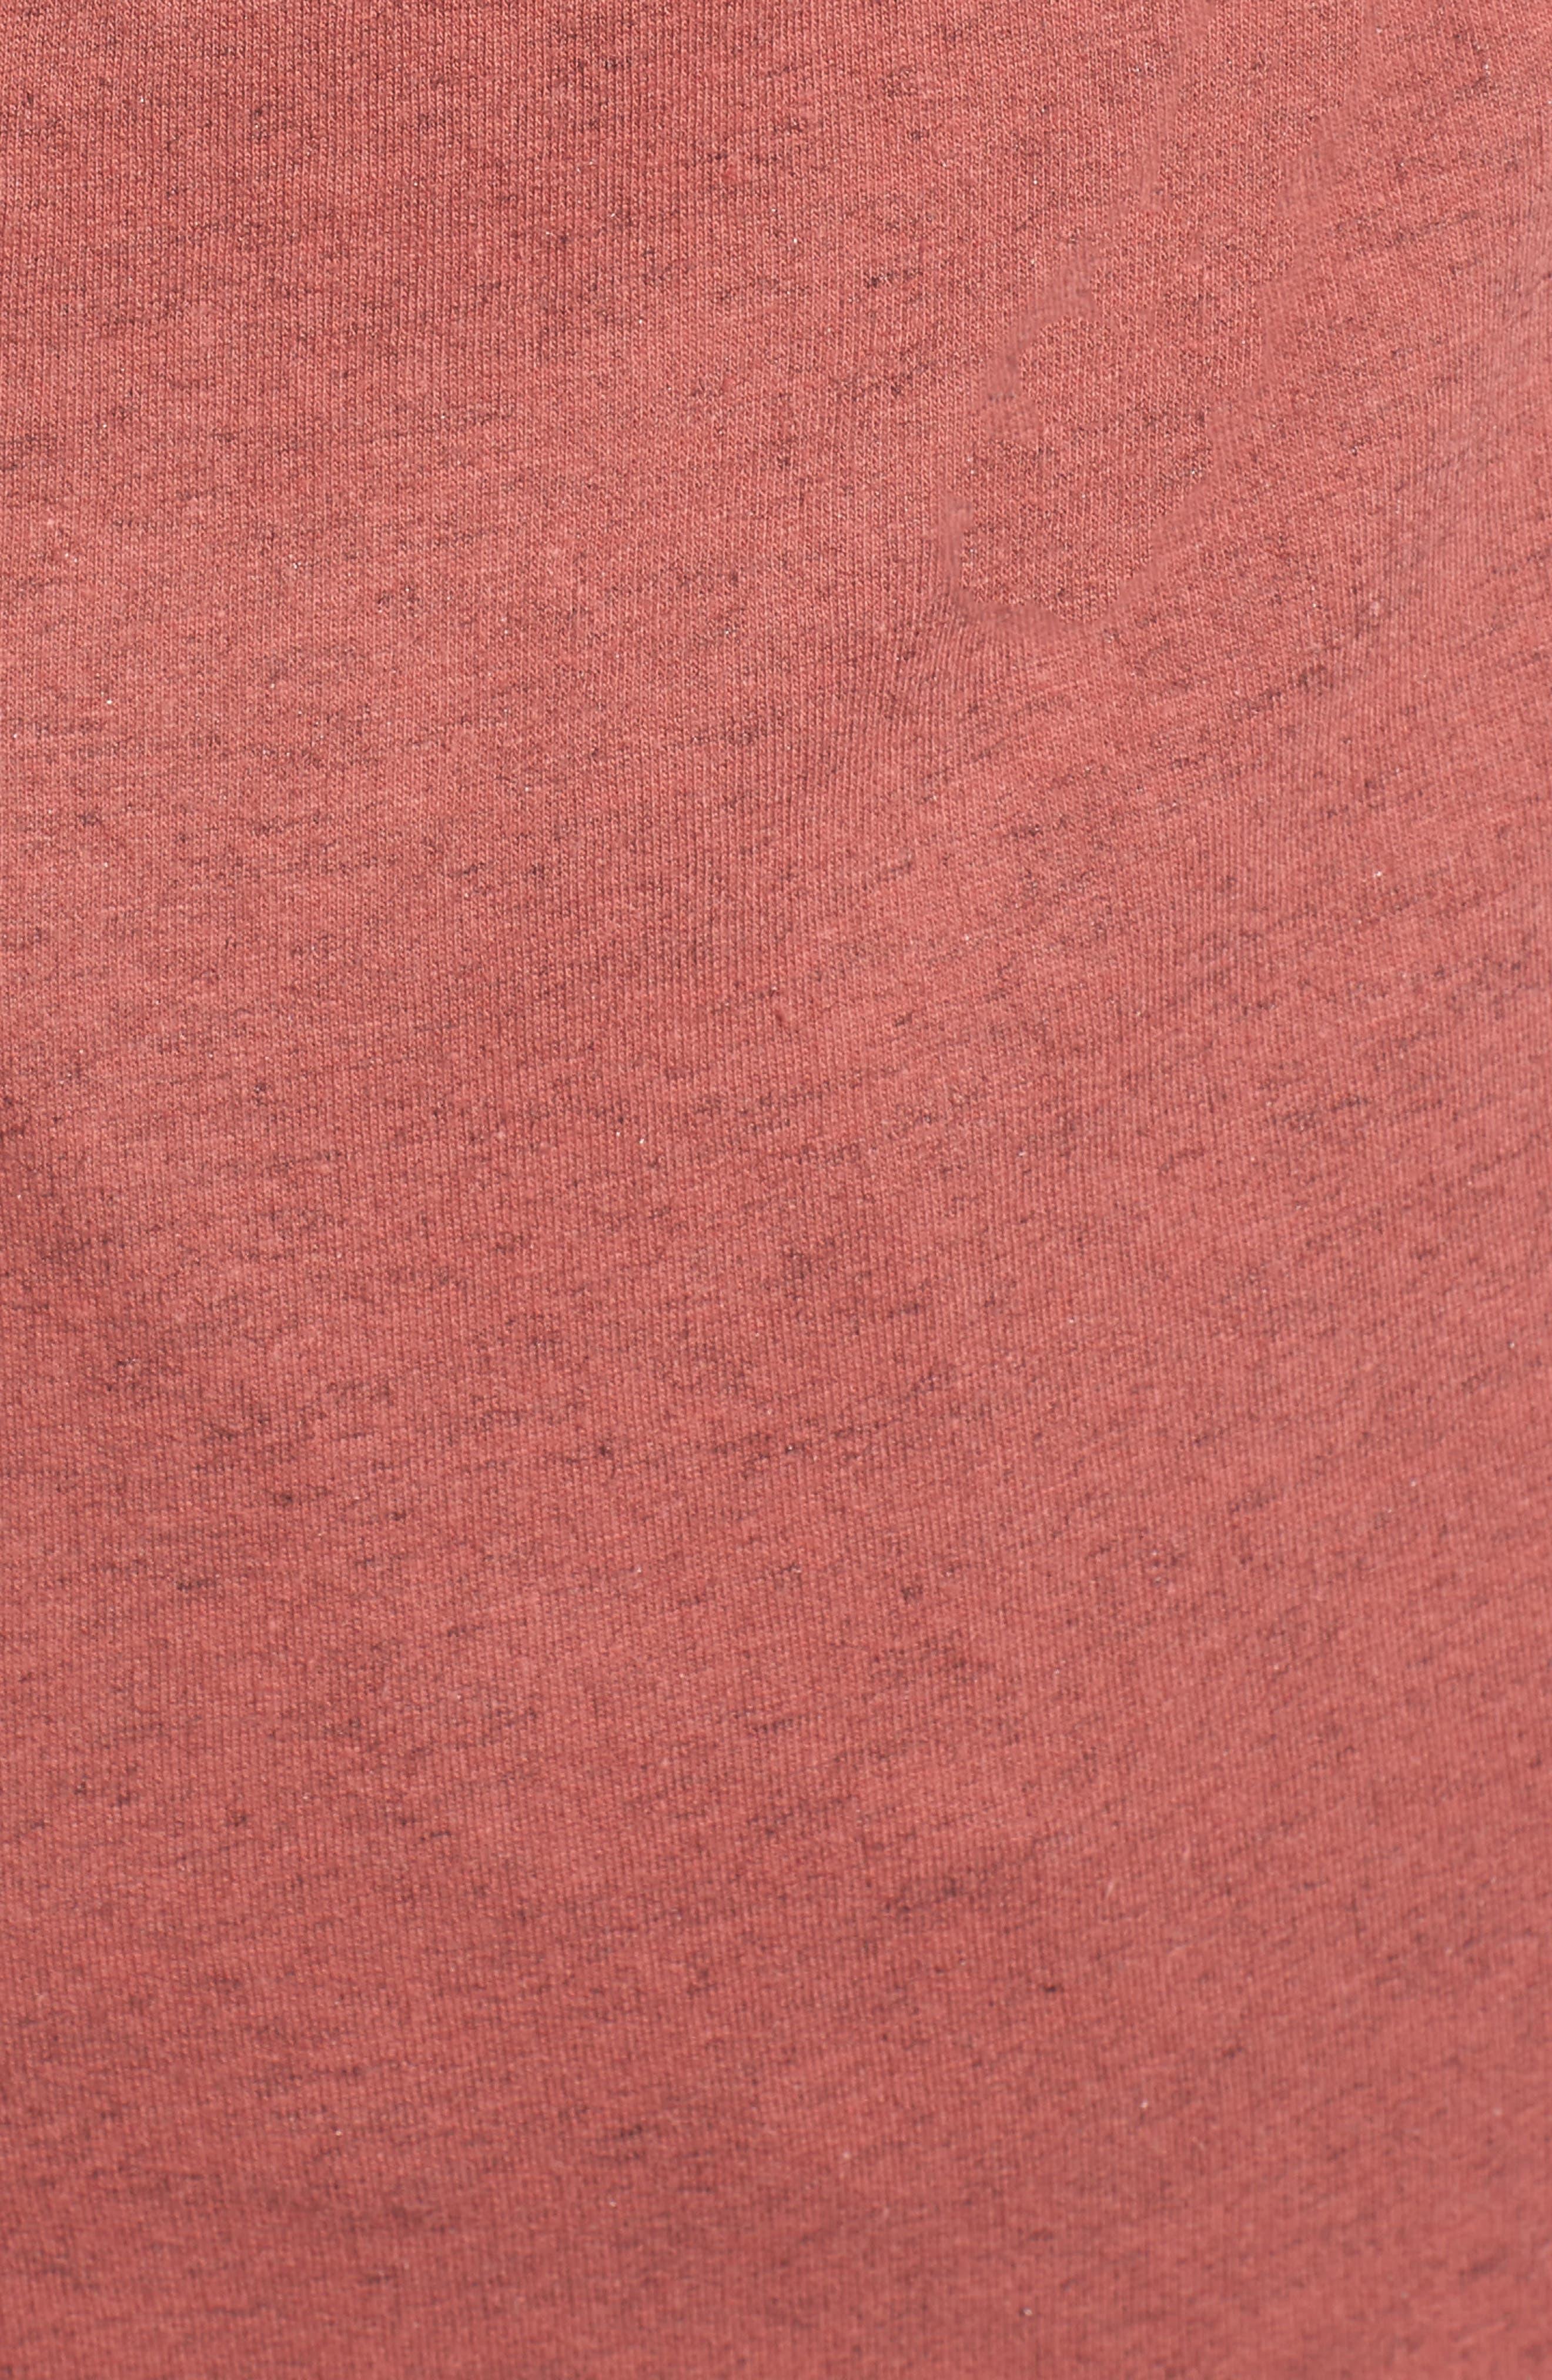 Stella Knit Jacket,                             Alternate thumbnail 56, color,